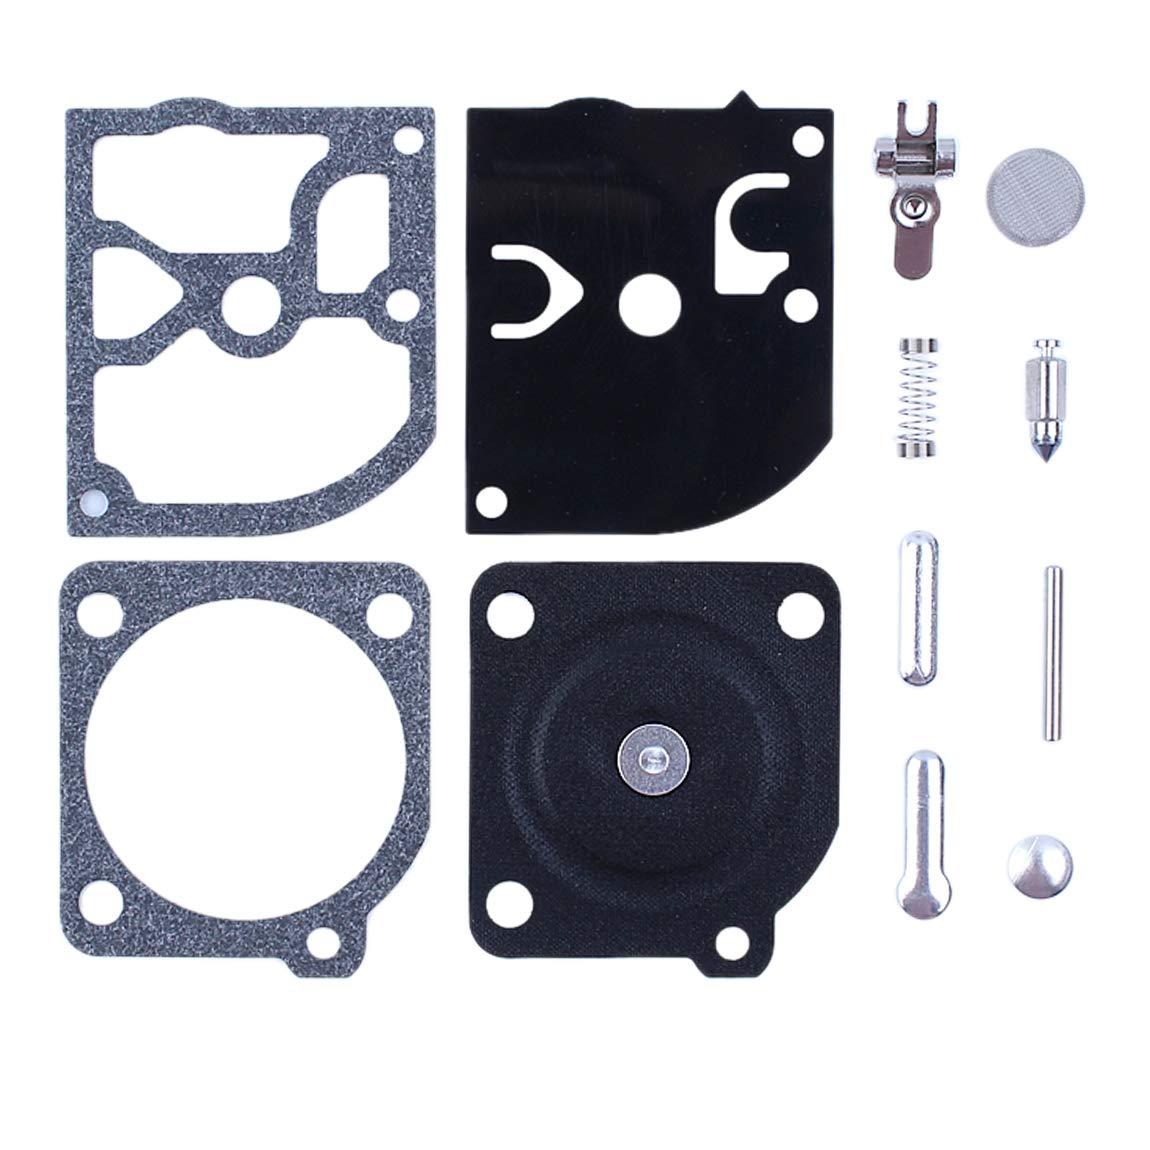 Haishine 2 Pz//Lotto Carb Carburatore Kit di Riparazione per Husqvarna 136 137 141 142 334T 338 XPT Motosega Zama C1Q-EL33 C1Q-EL33A